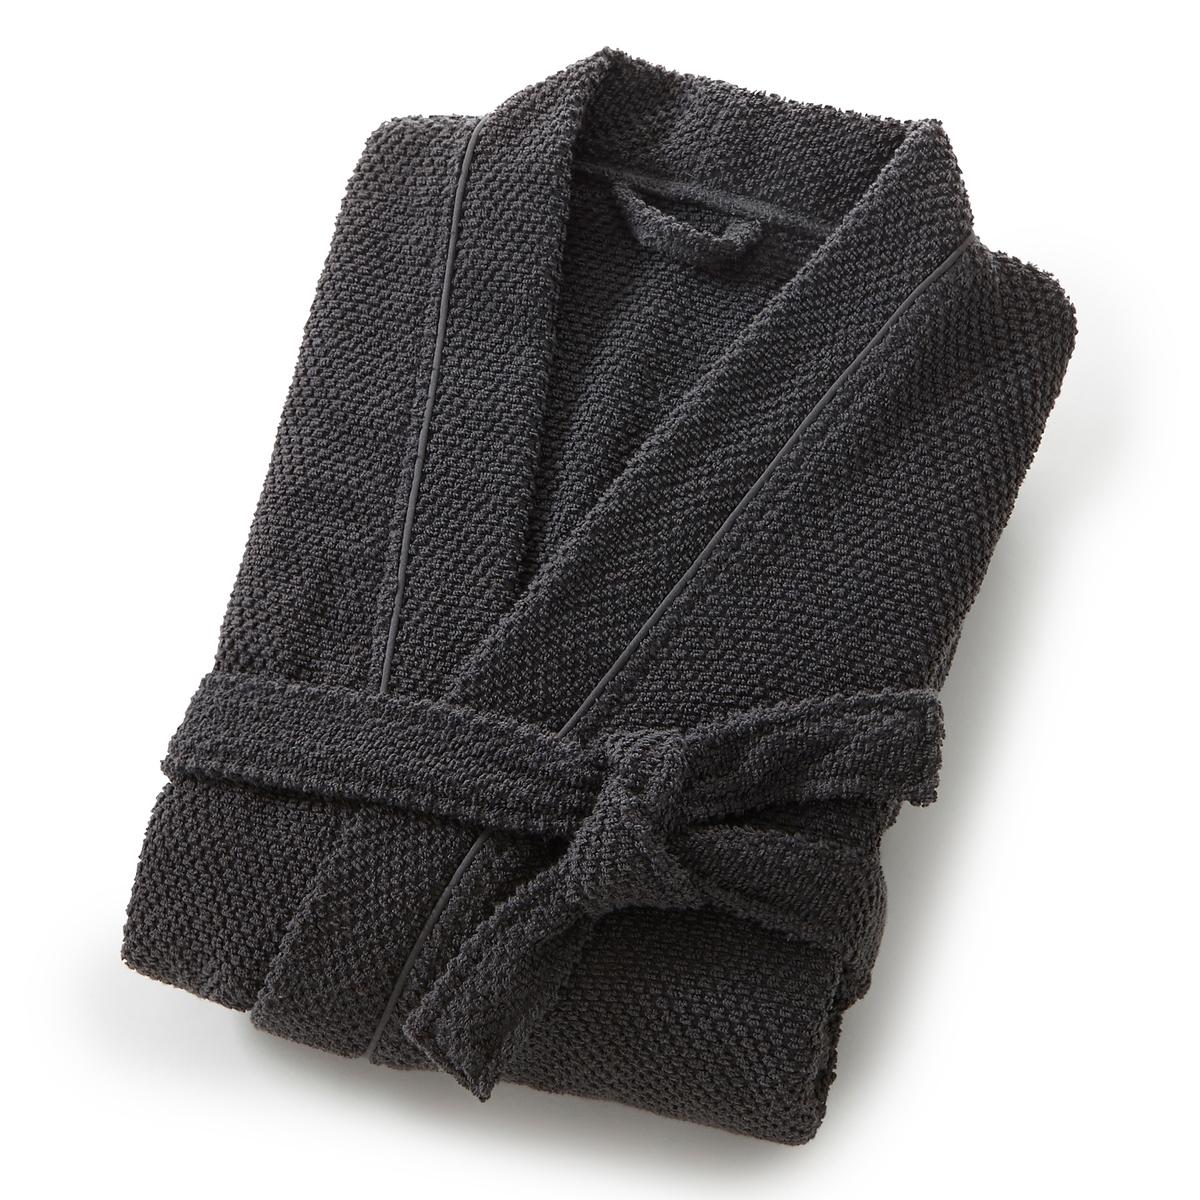 Халат-кимоно мужской, 100% хлопок